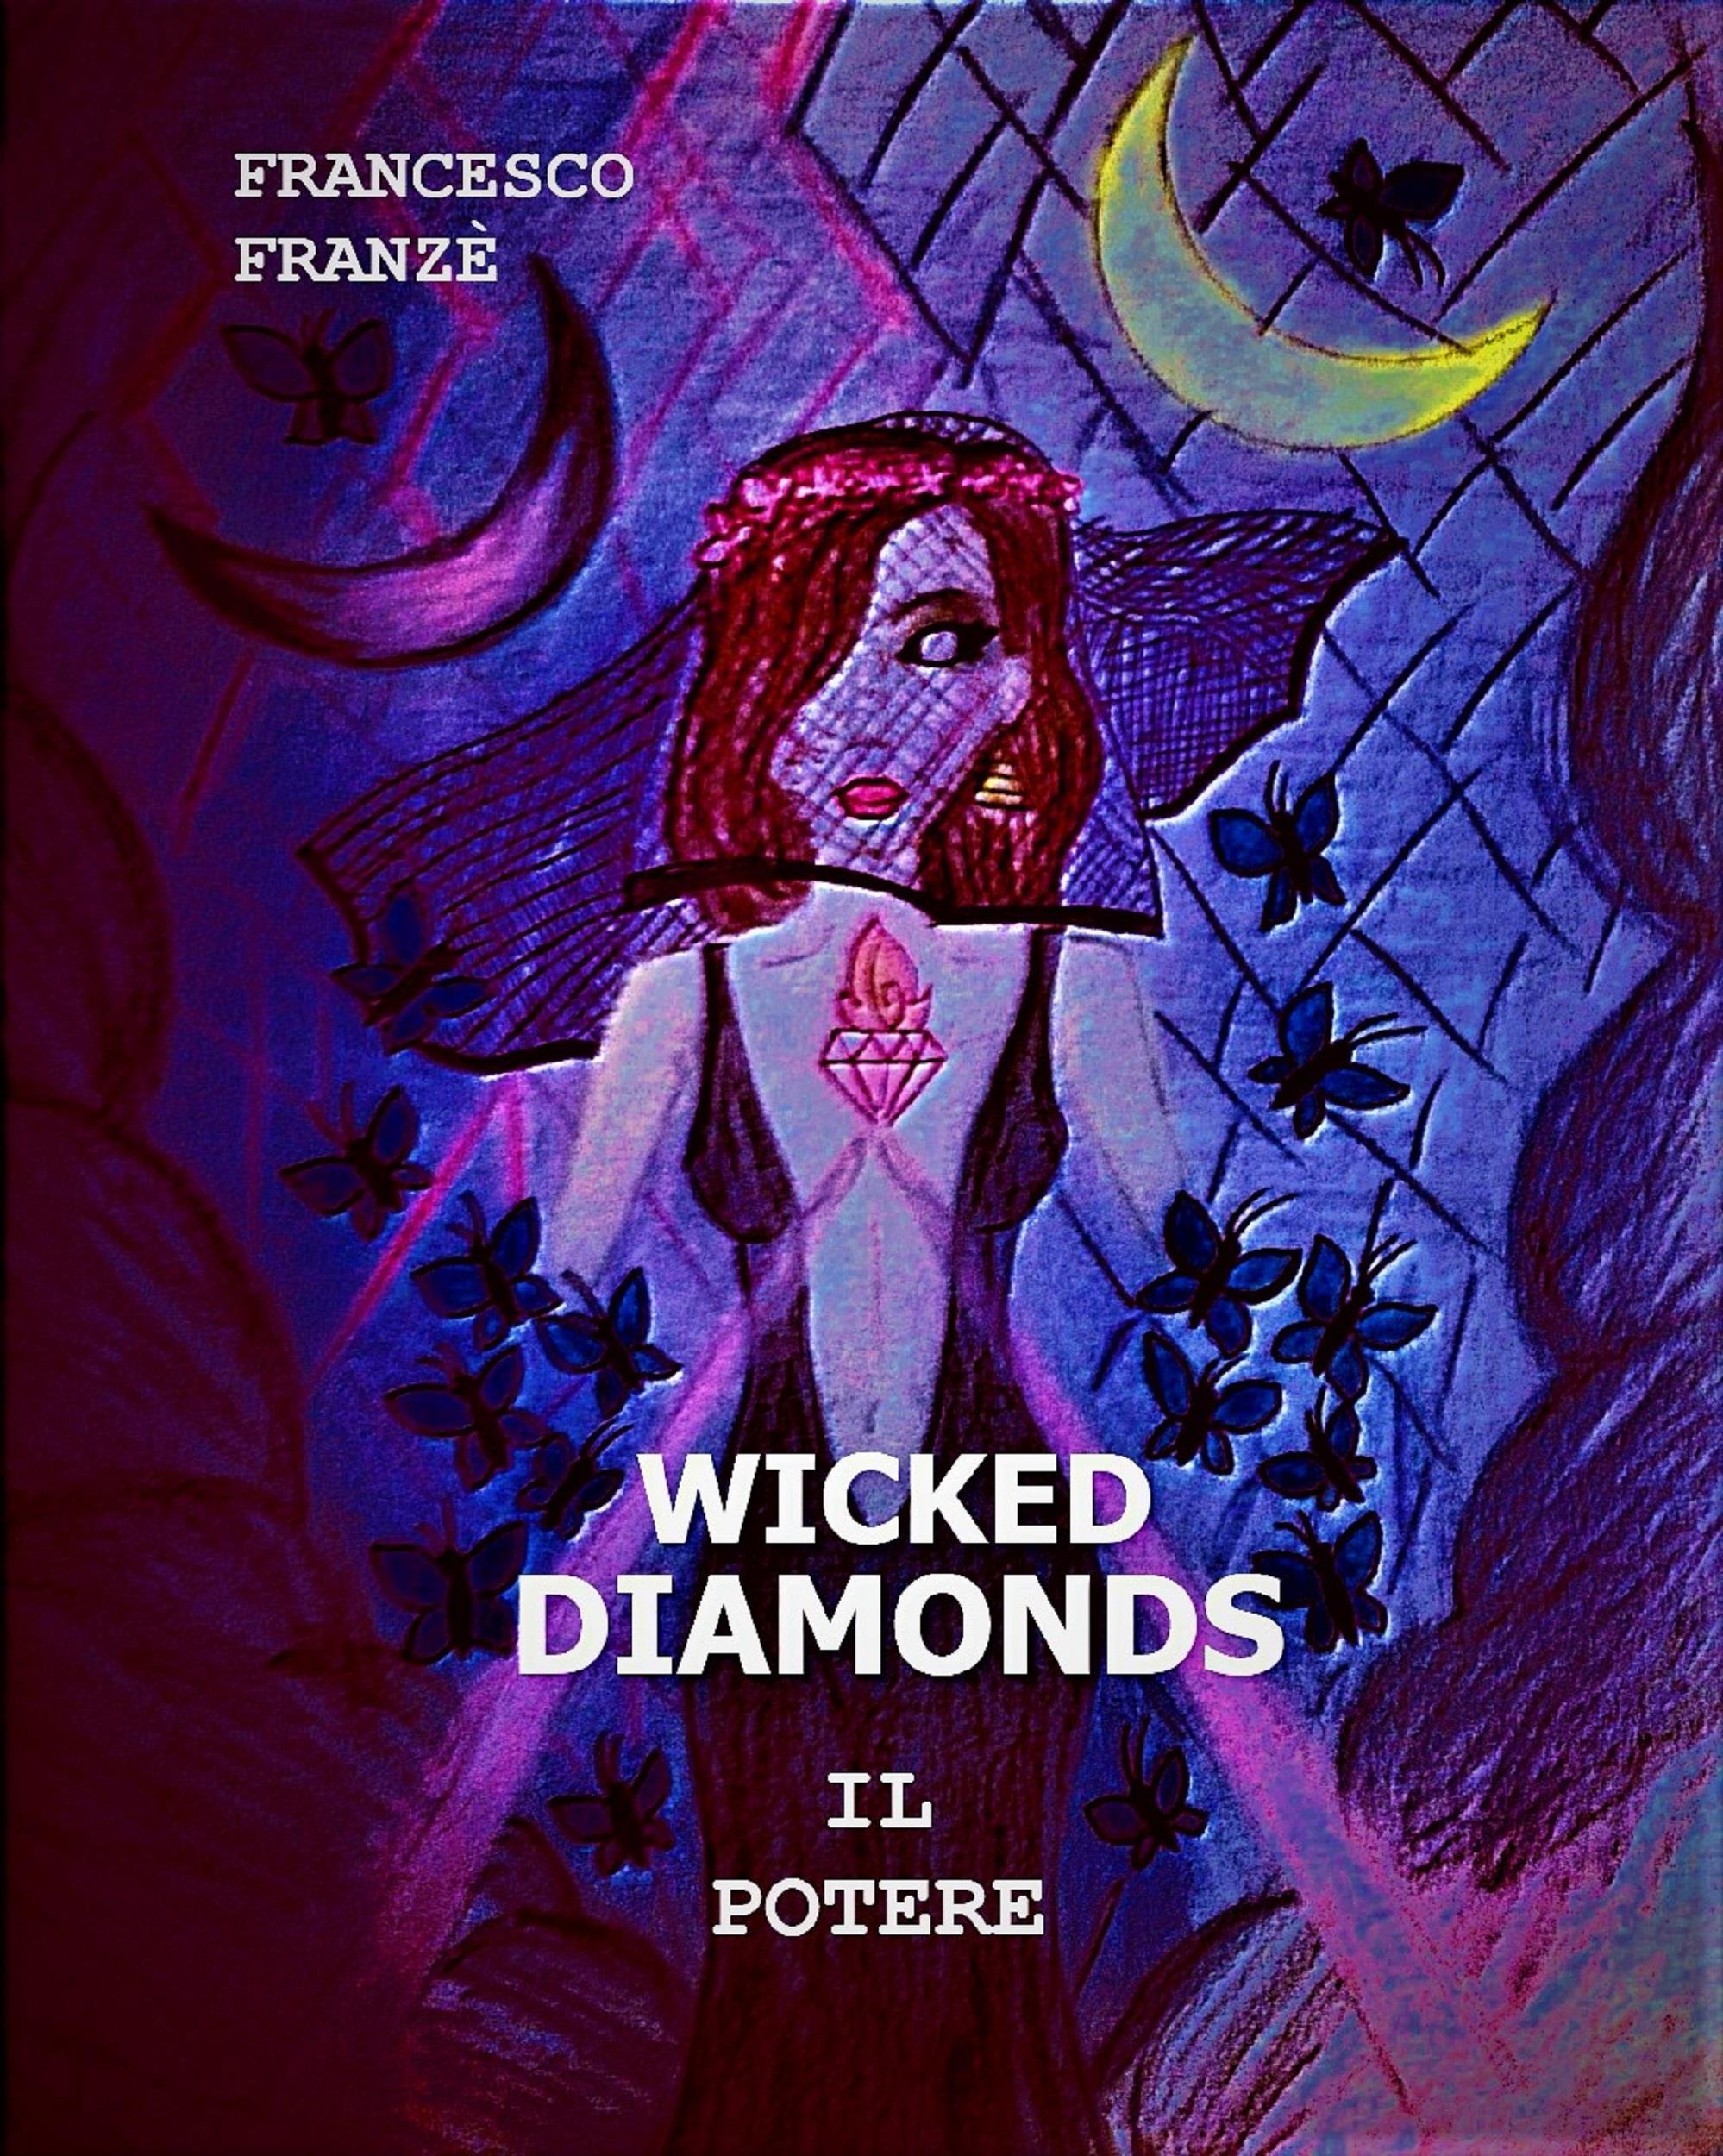 Wicked Diamonds - Il Potere